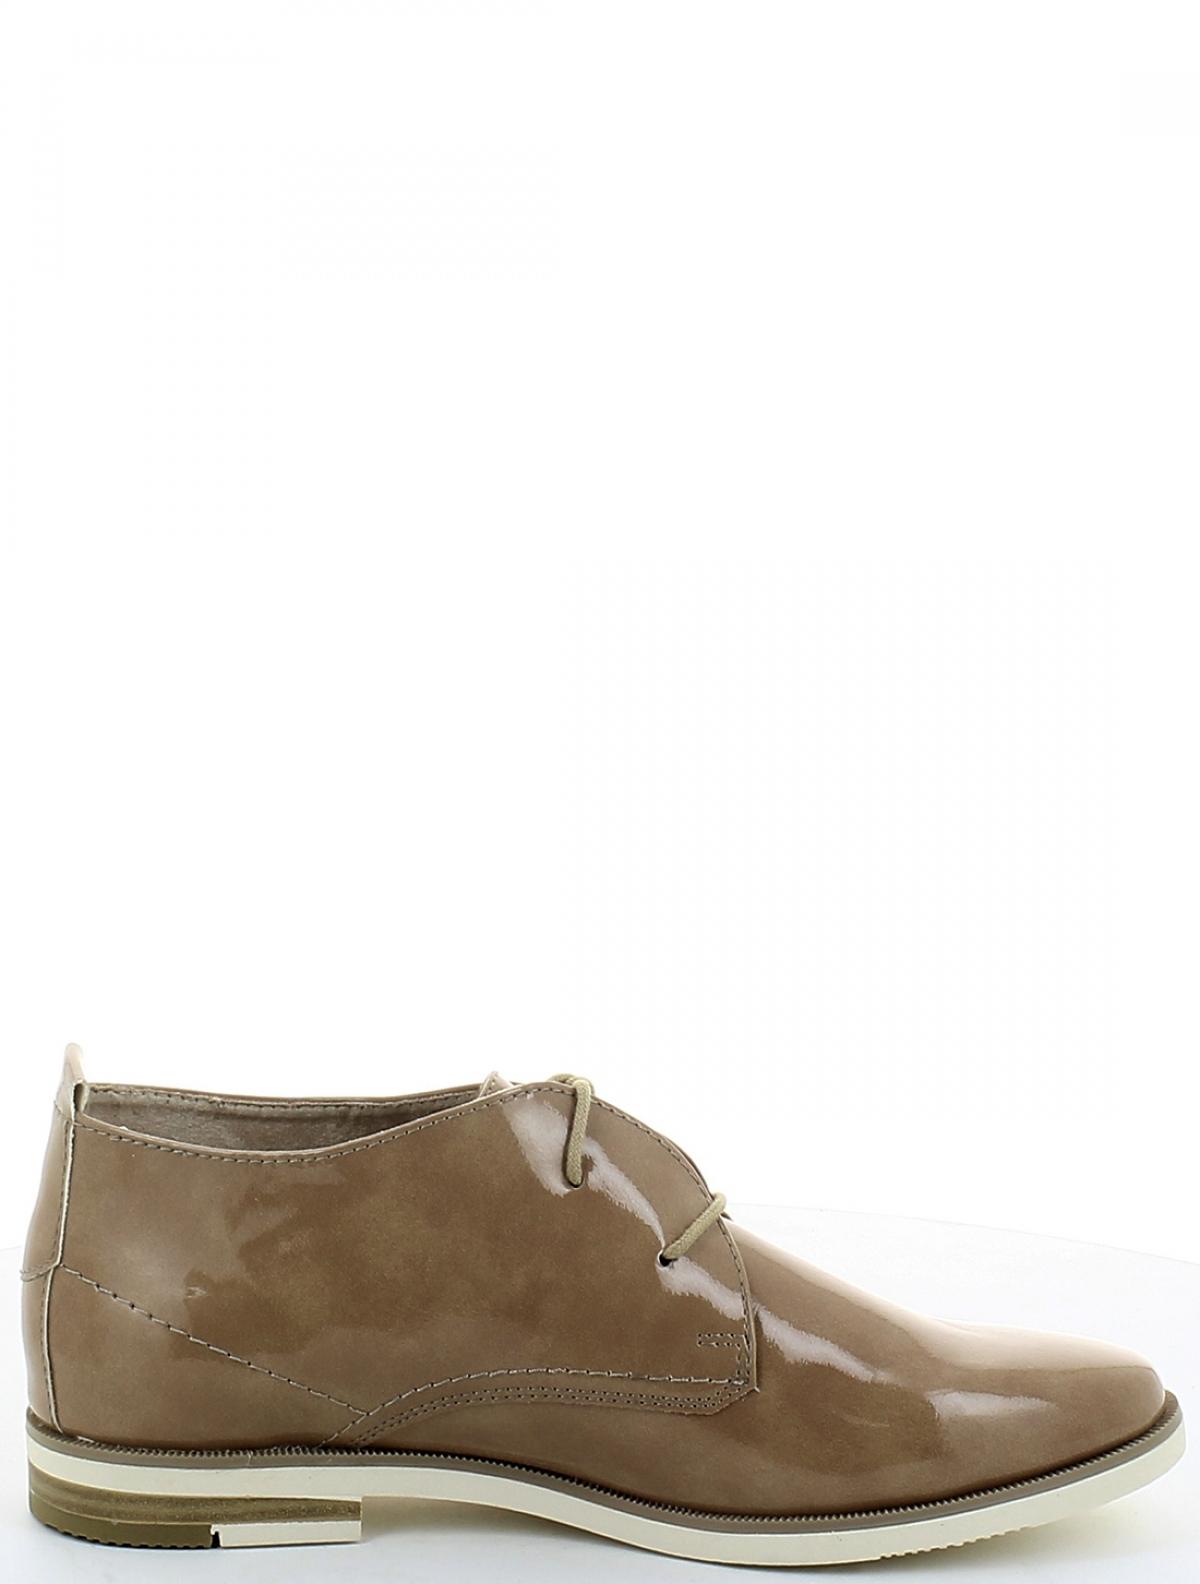 Marco Tozzi 2-25119-38-535 женские ботинки